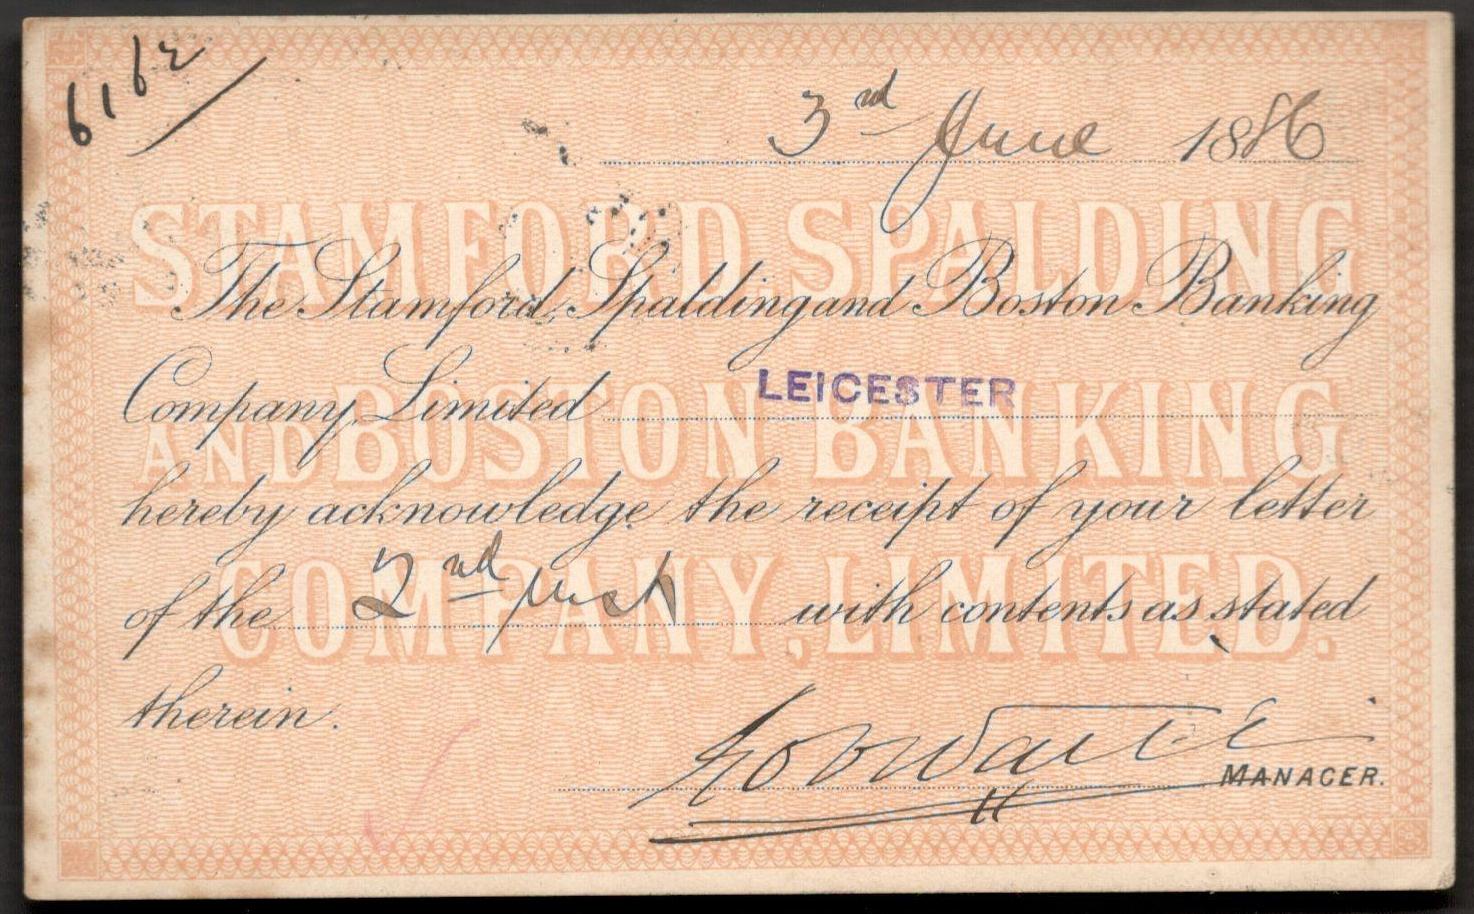 QV POSTAL STATIONERY CARD 1886 STAMFORD SPALDING